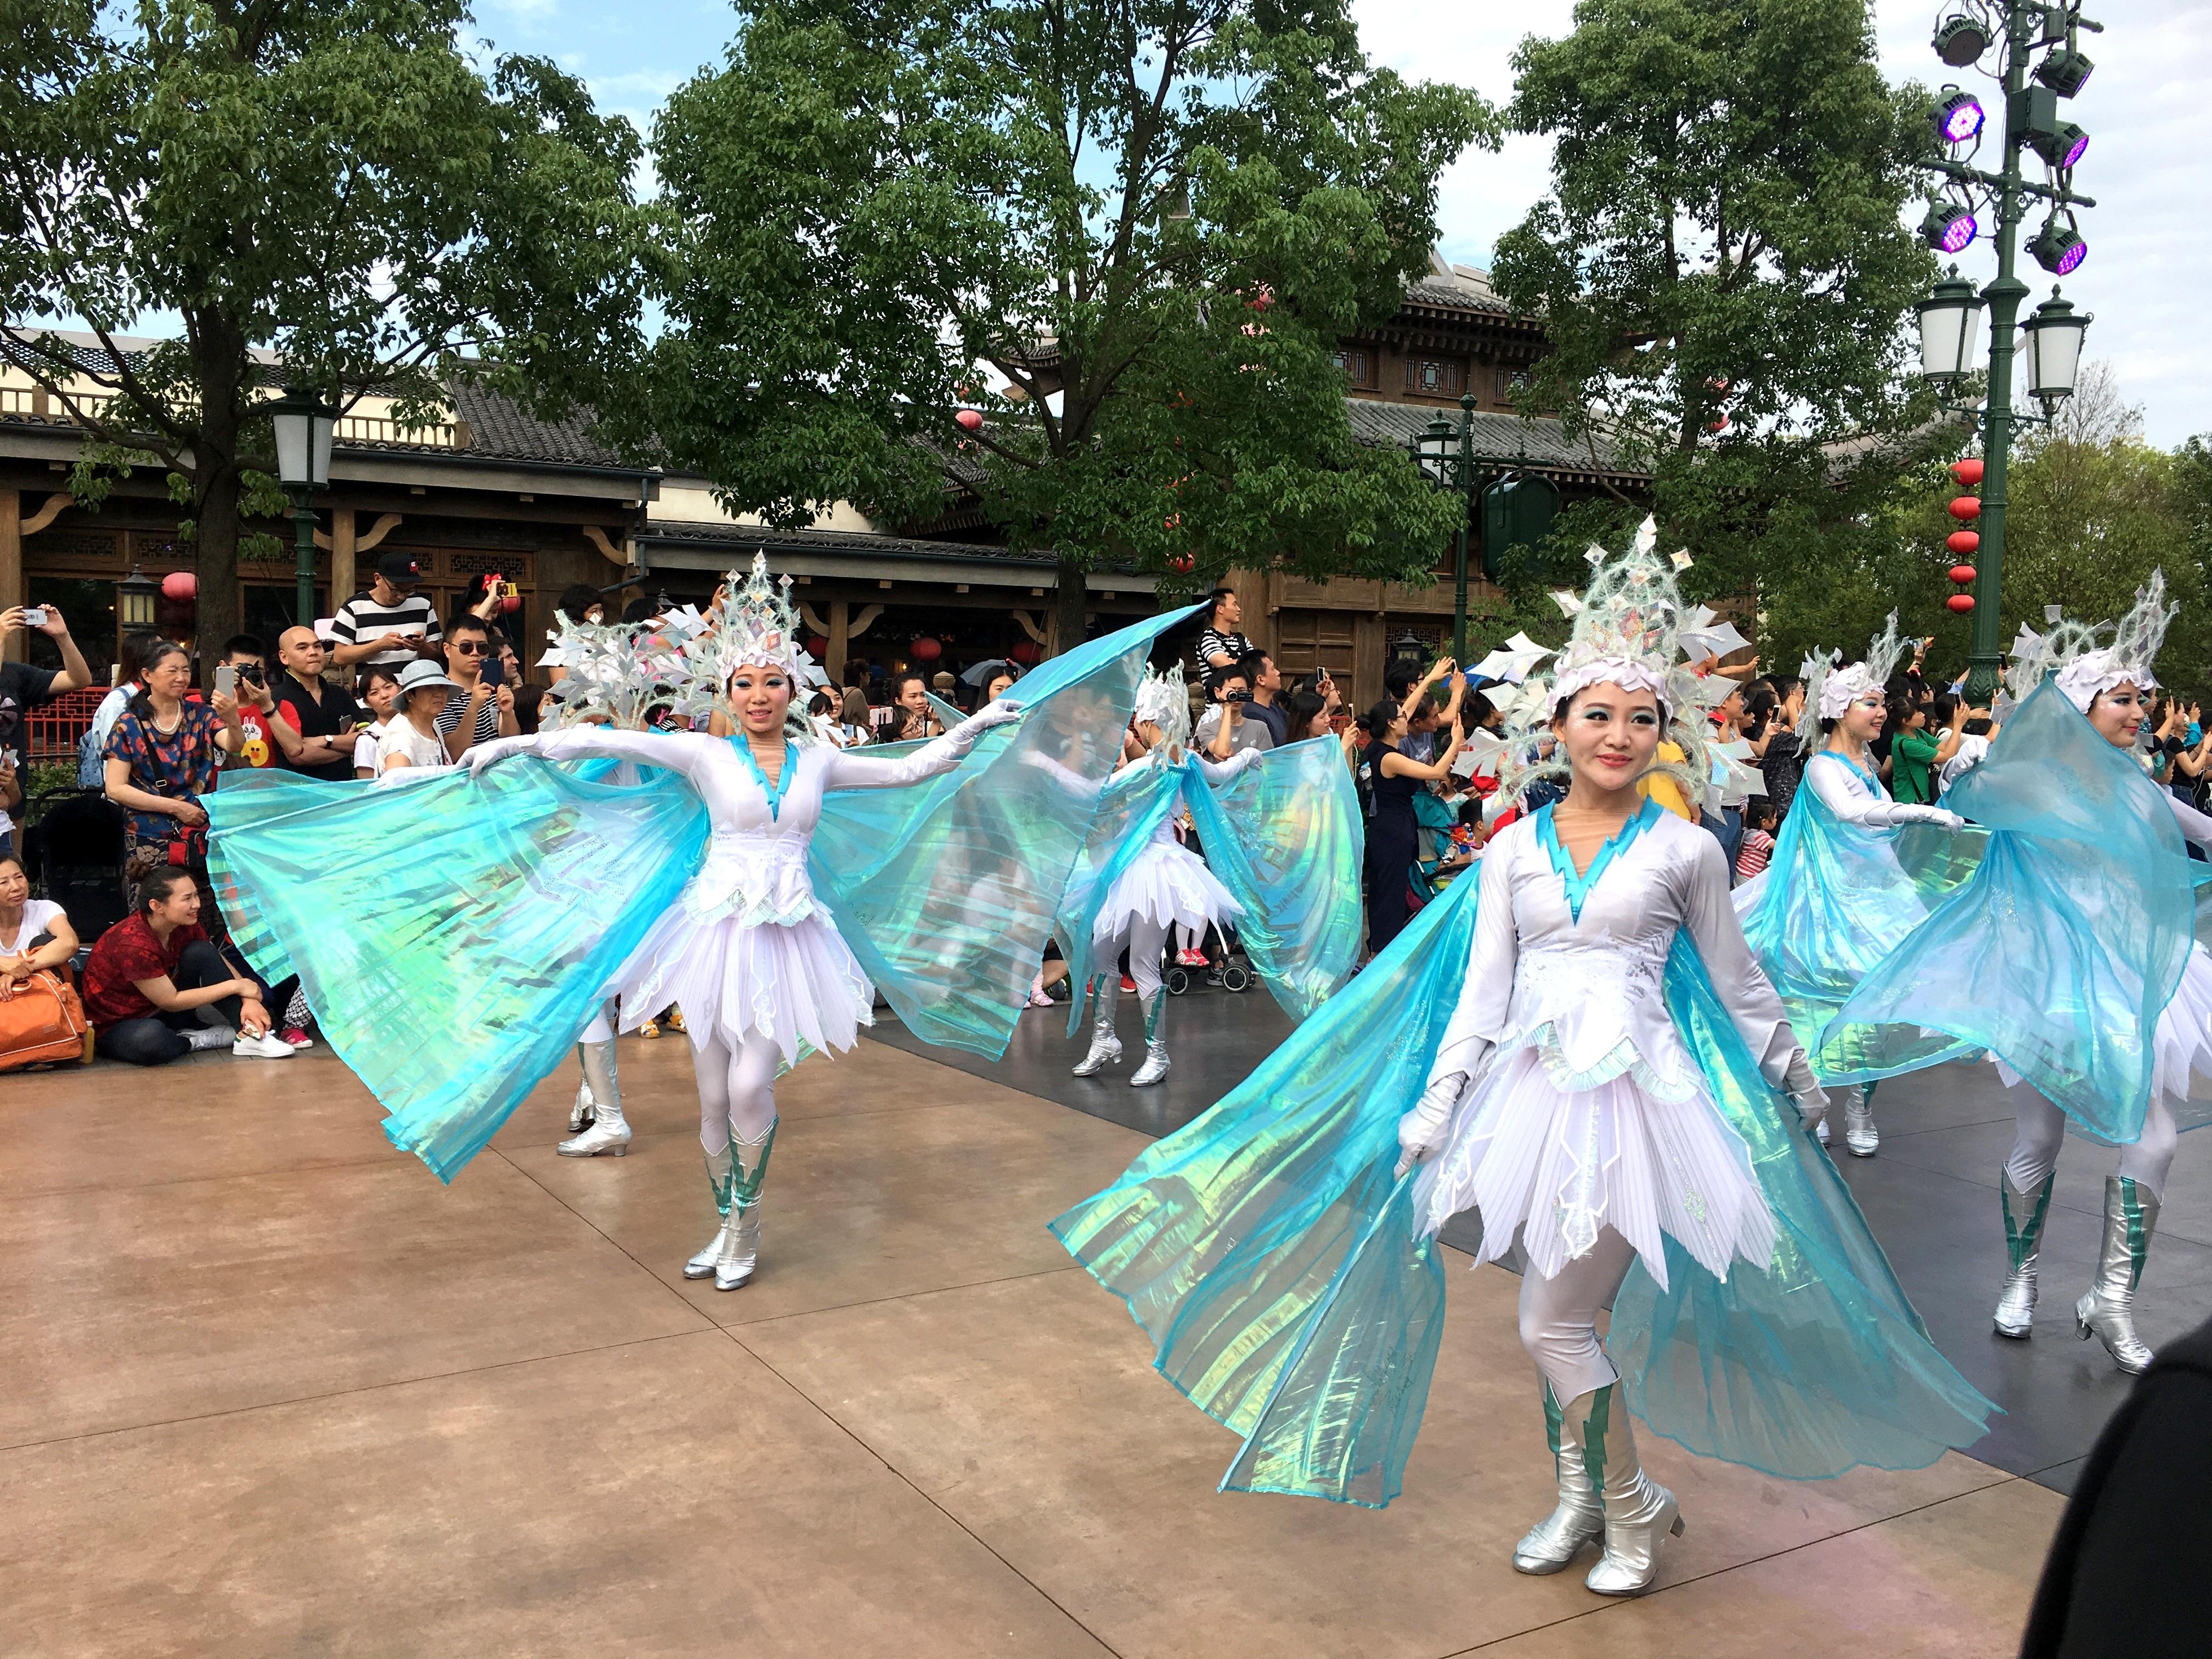 shanghai-disneyland-mickeys-storybook-express-parade-3